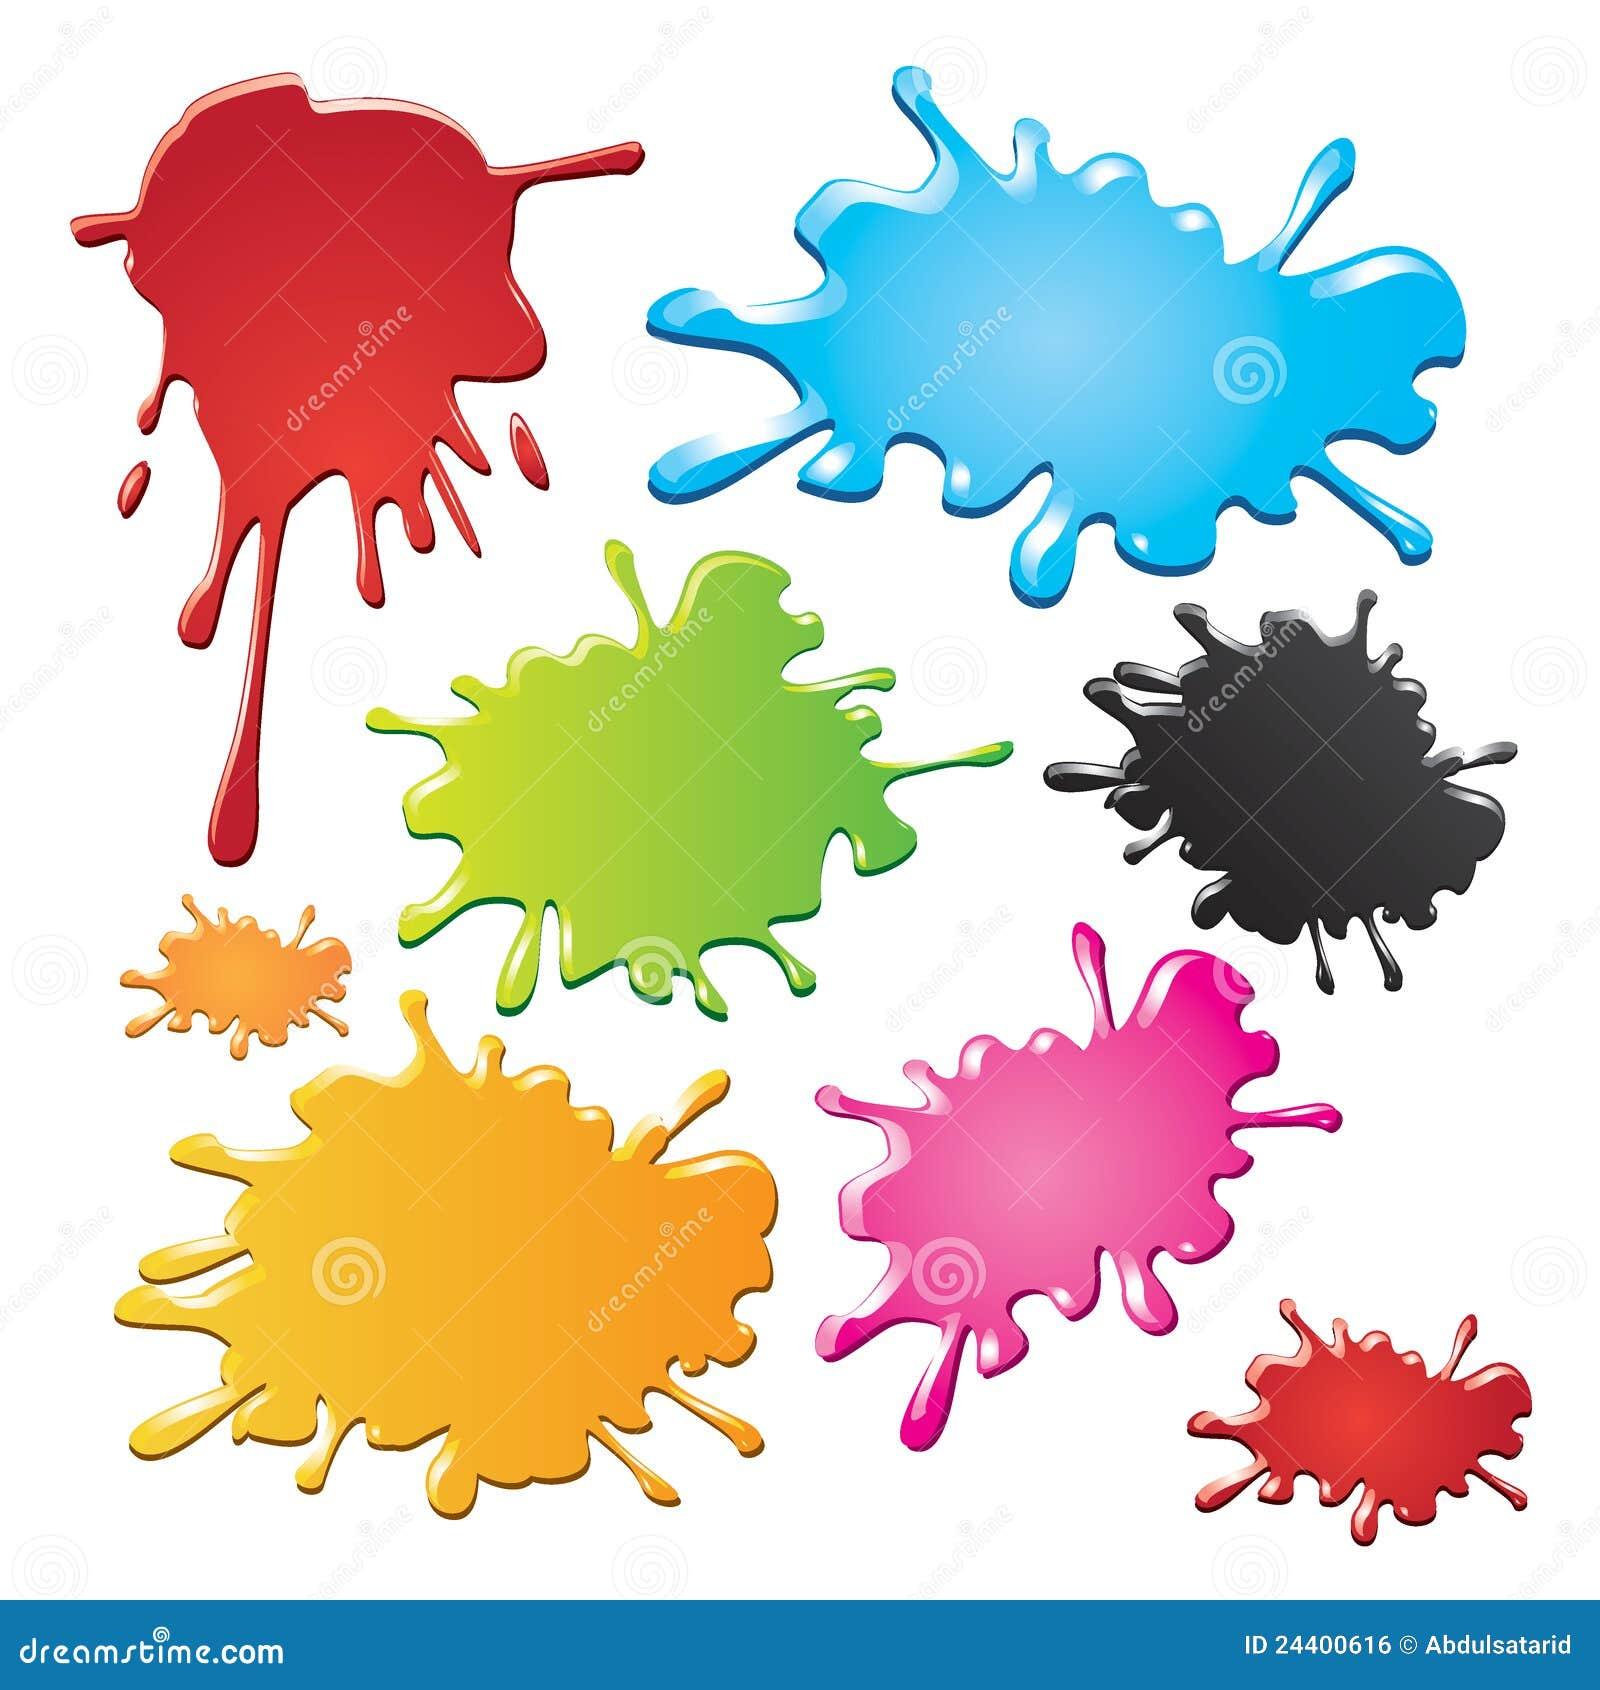 Pics photos watercolor splash background - Colorful Ink Splashes Royalty Free Stock Image Image